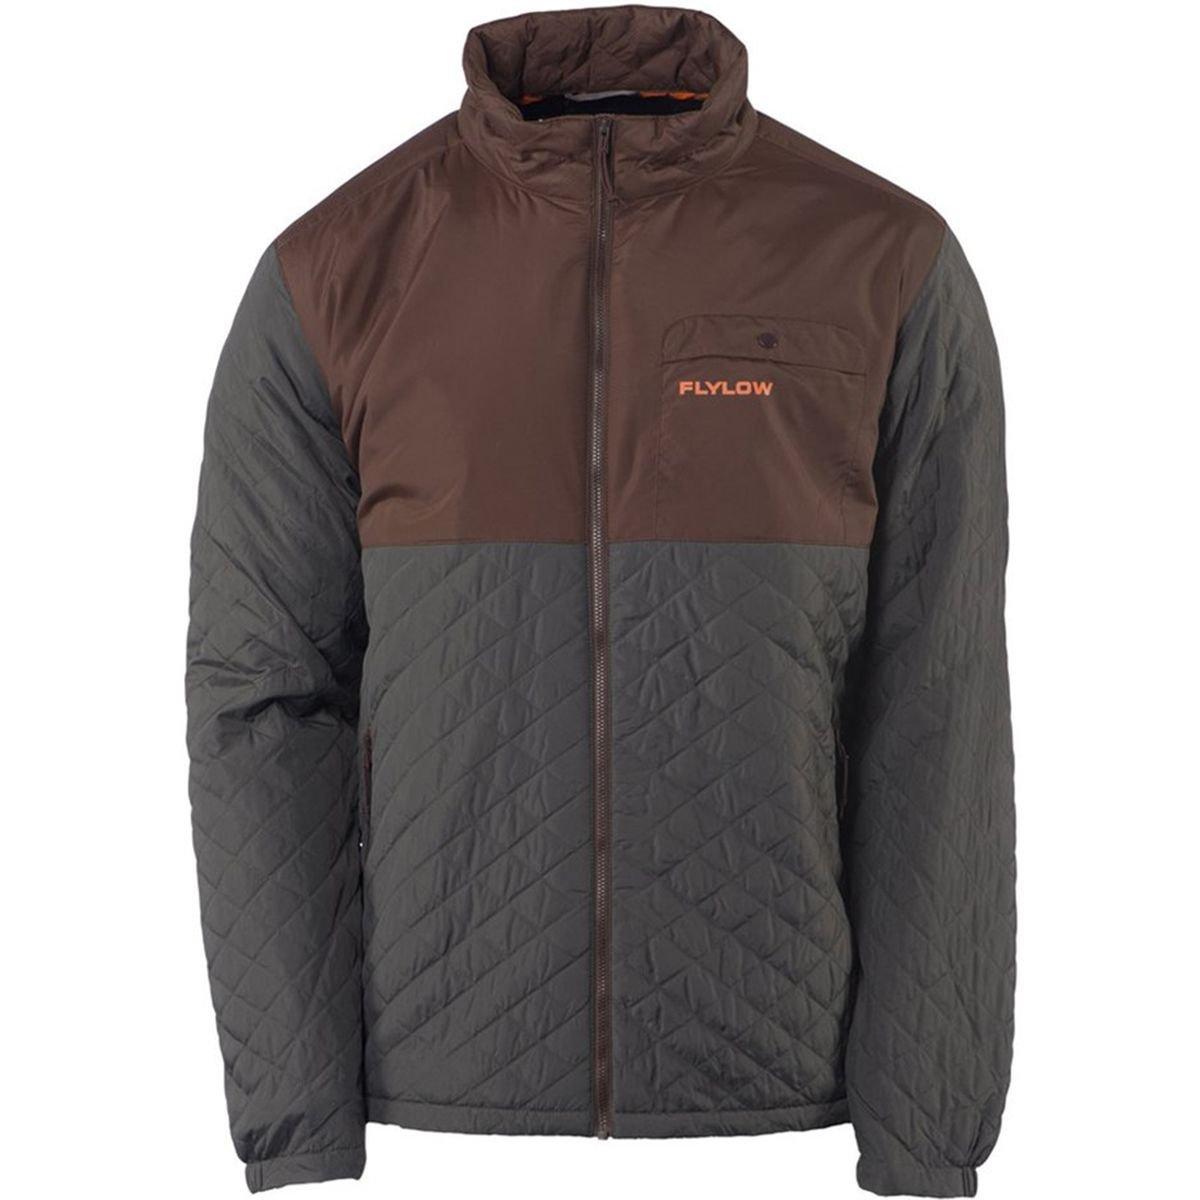 Flylow Gear Dexter Insulated Jacket – Men 's B075LS7JKG Small|Granite/Cola Granite/Cola Small